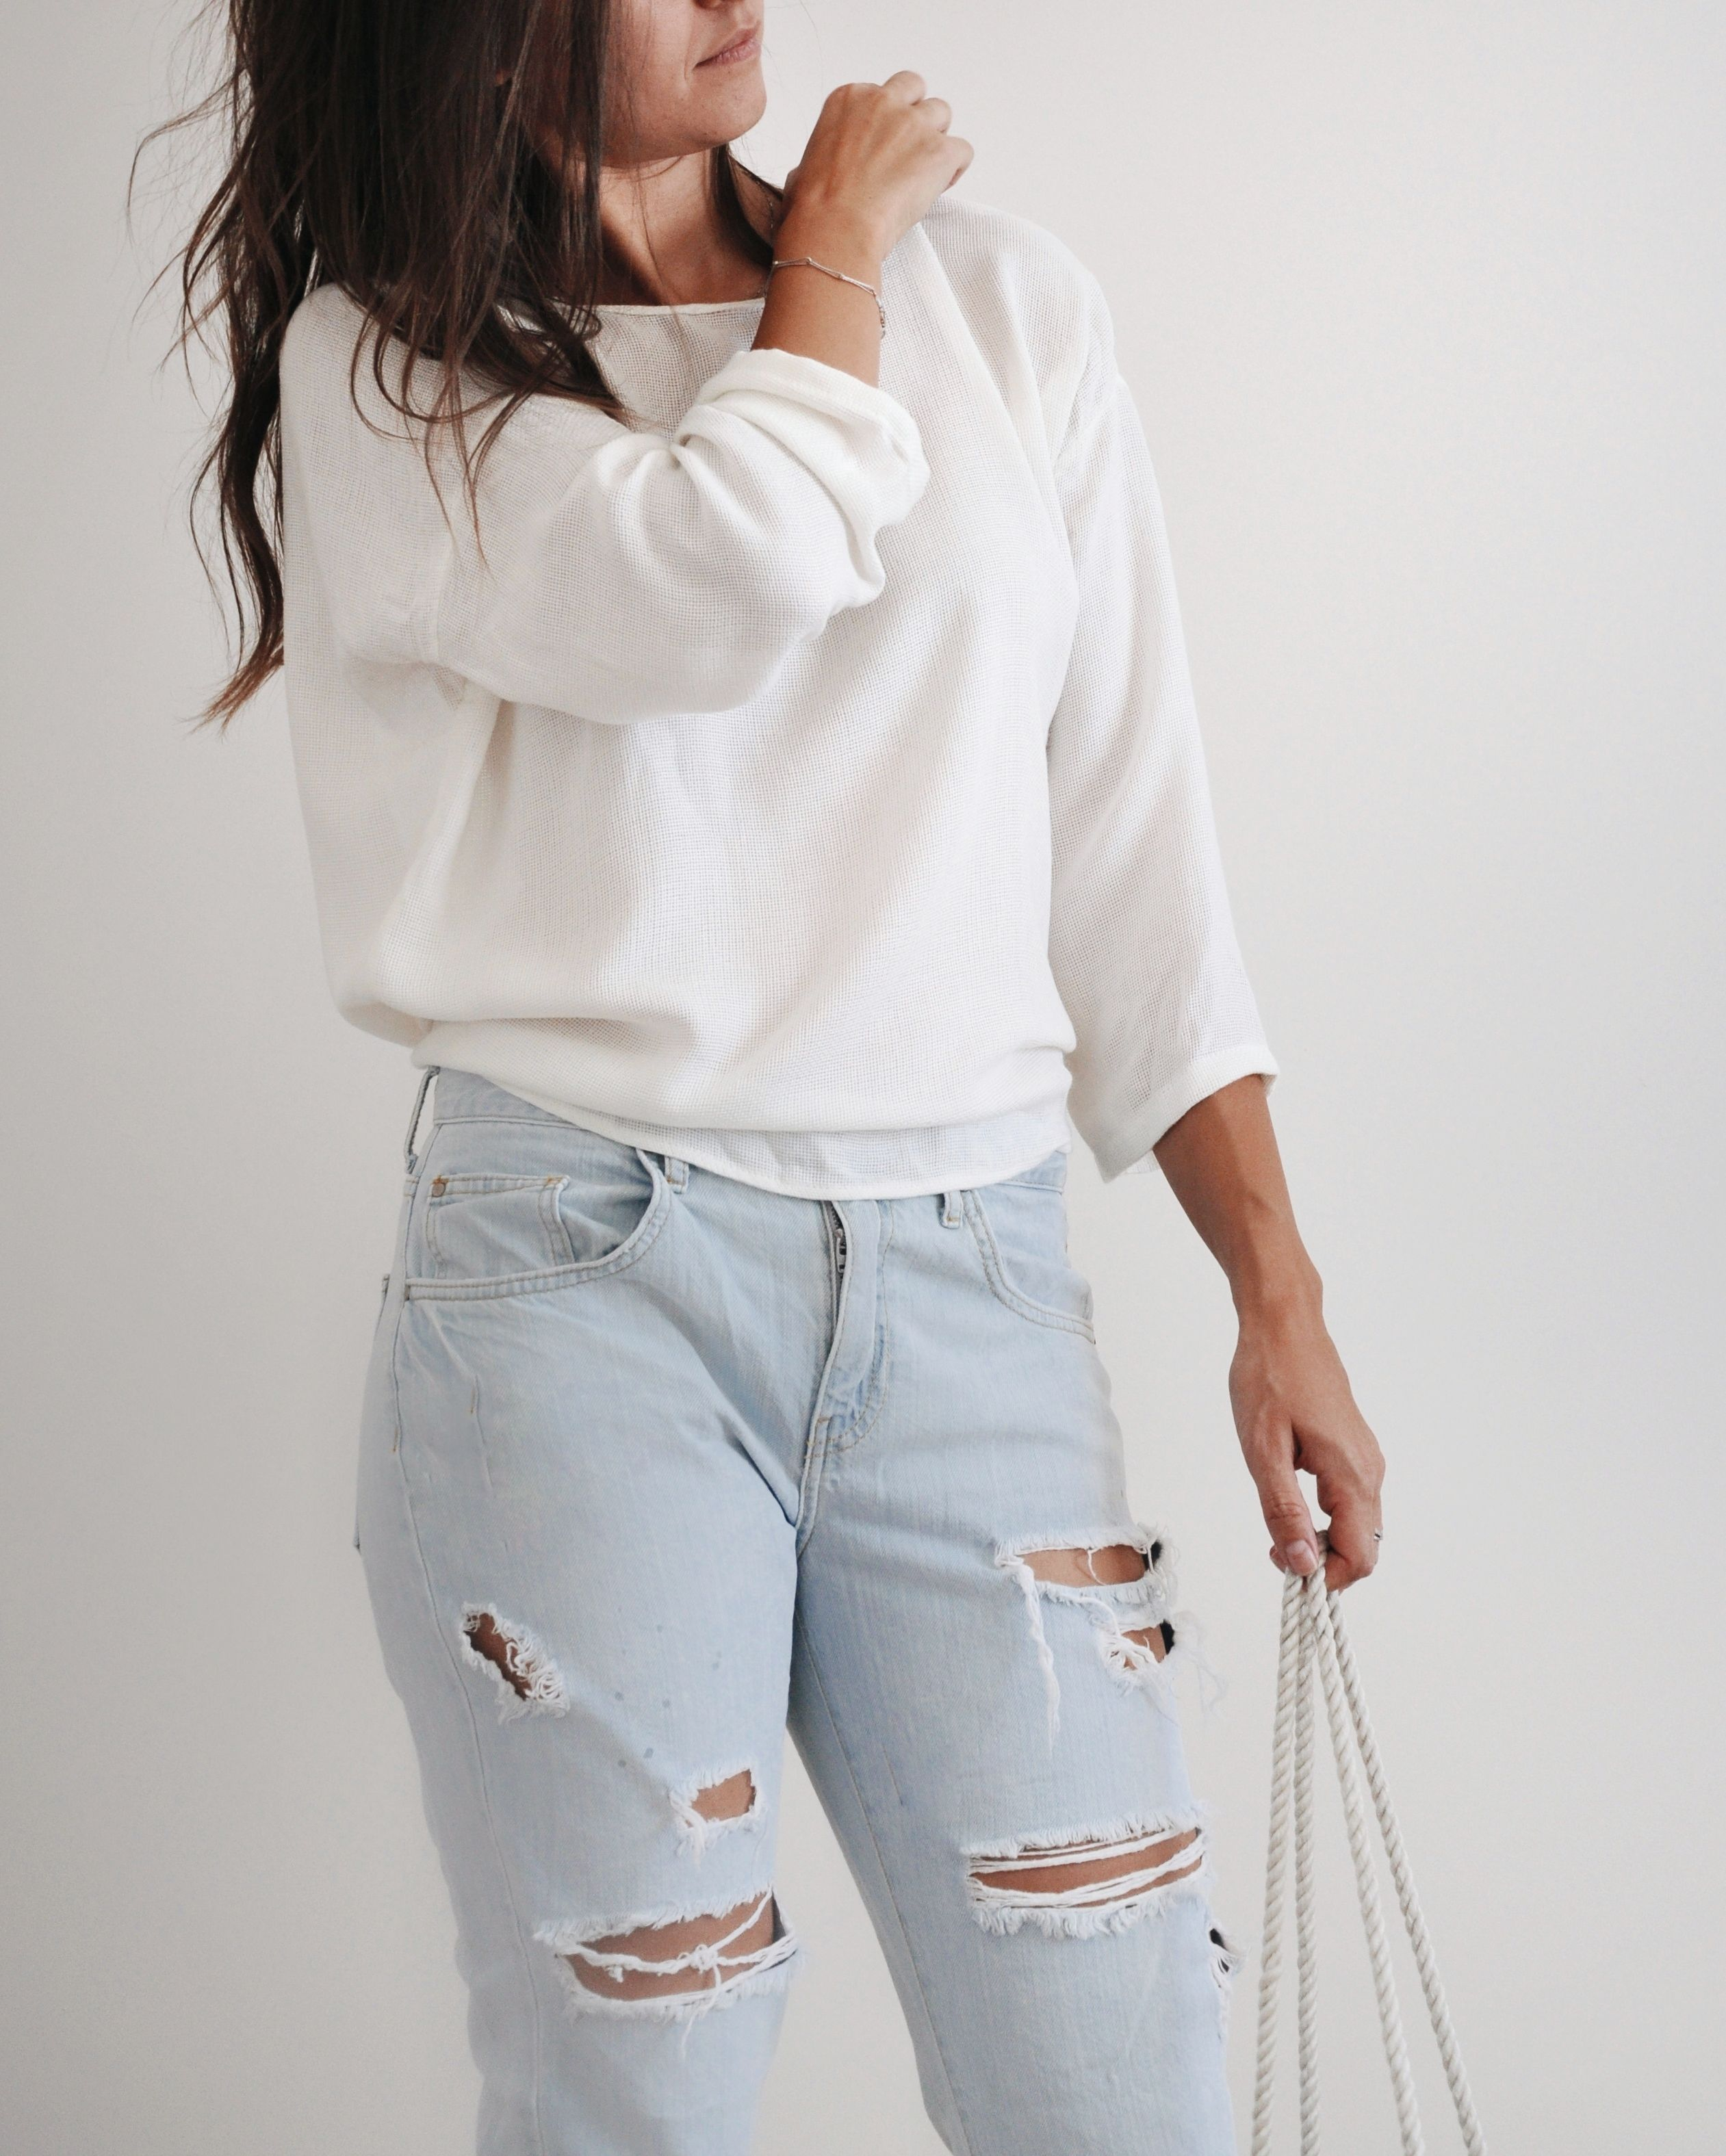 LAYLA - open back blouse